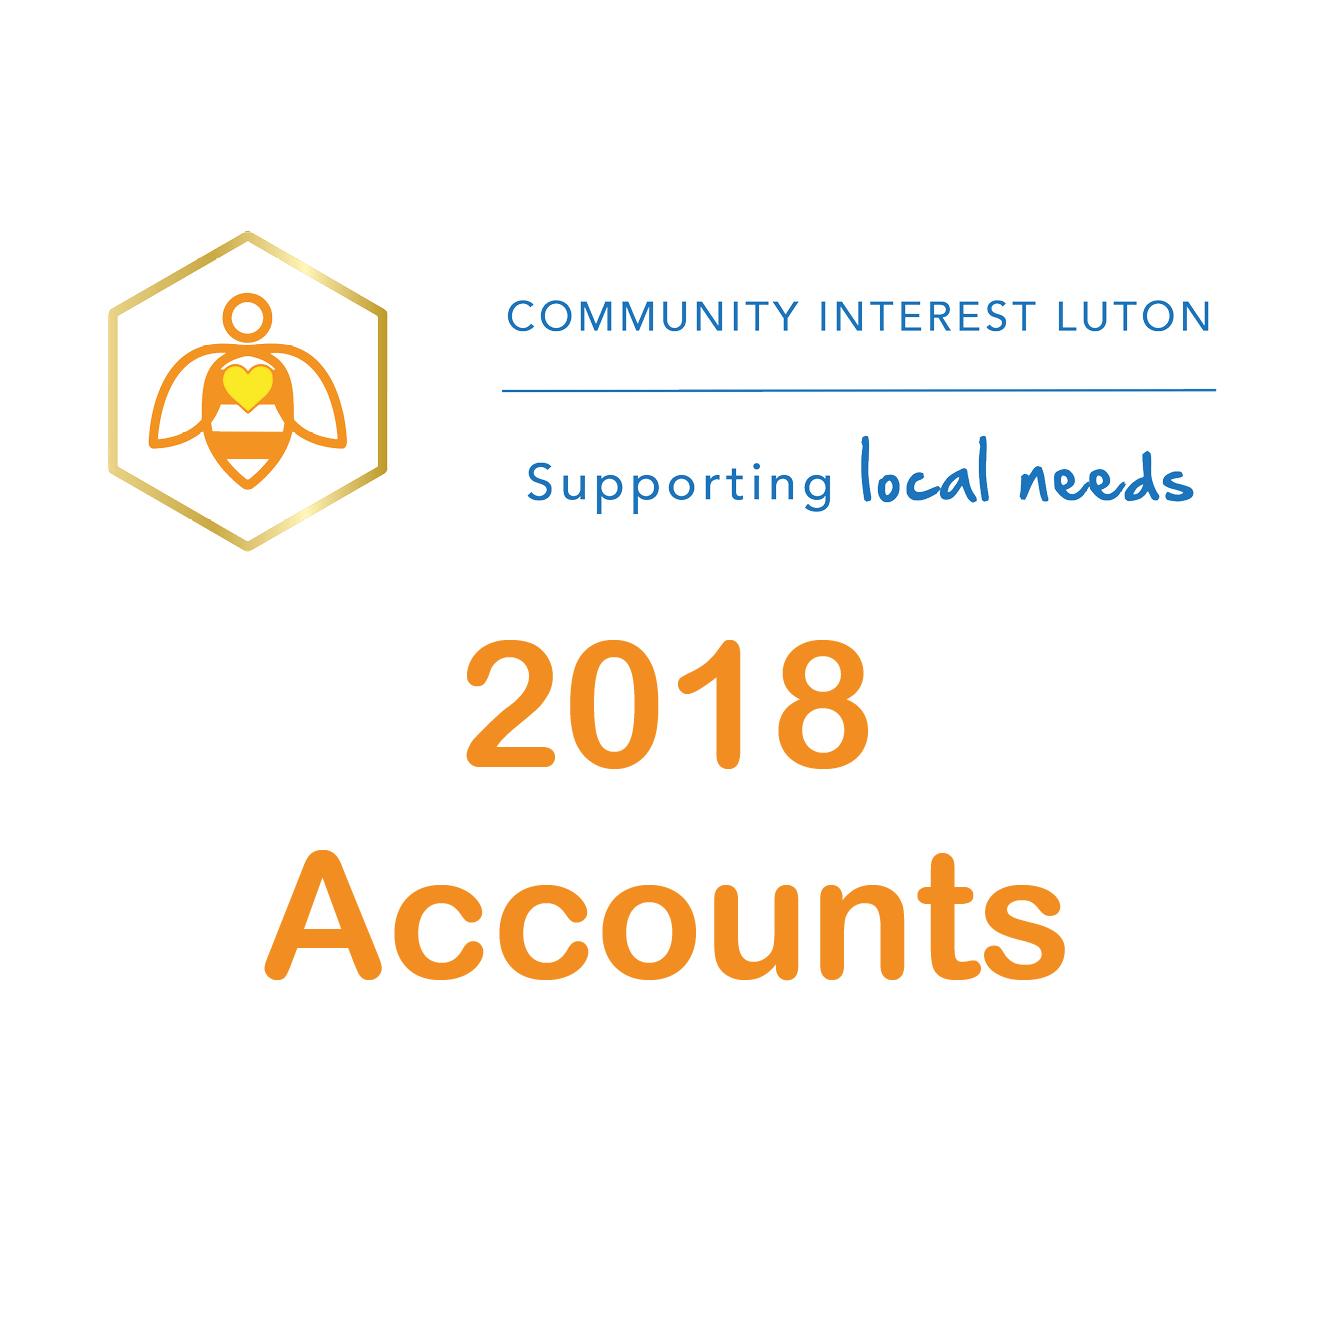 2018 Accounts